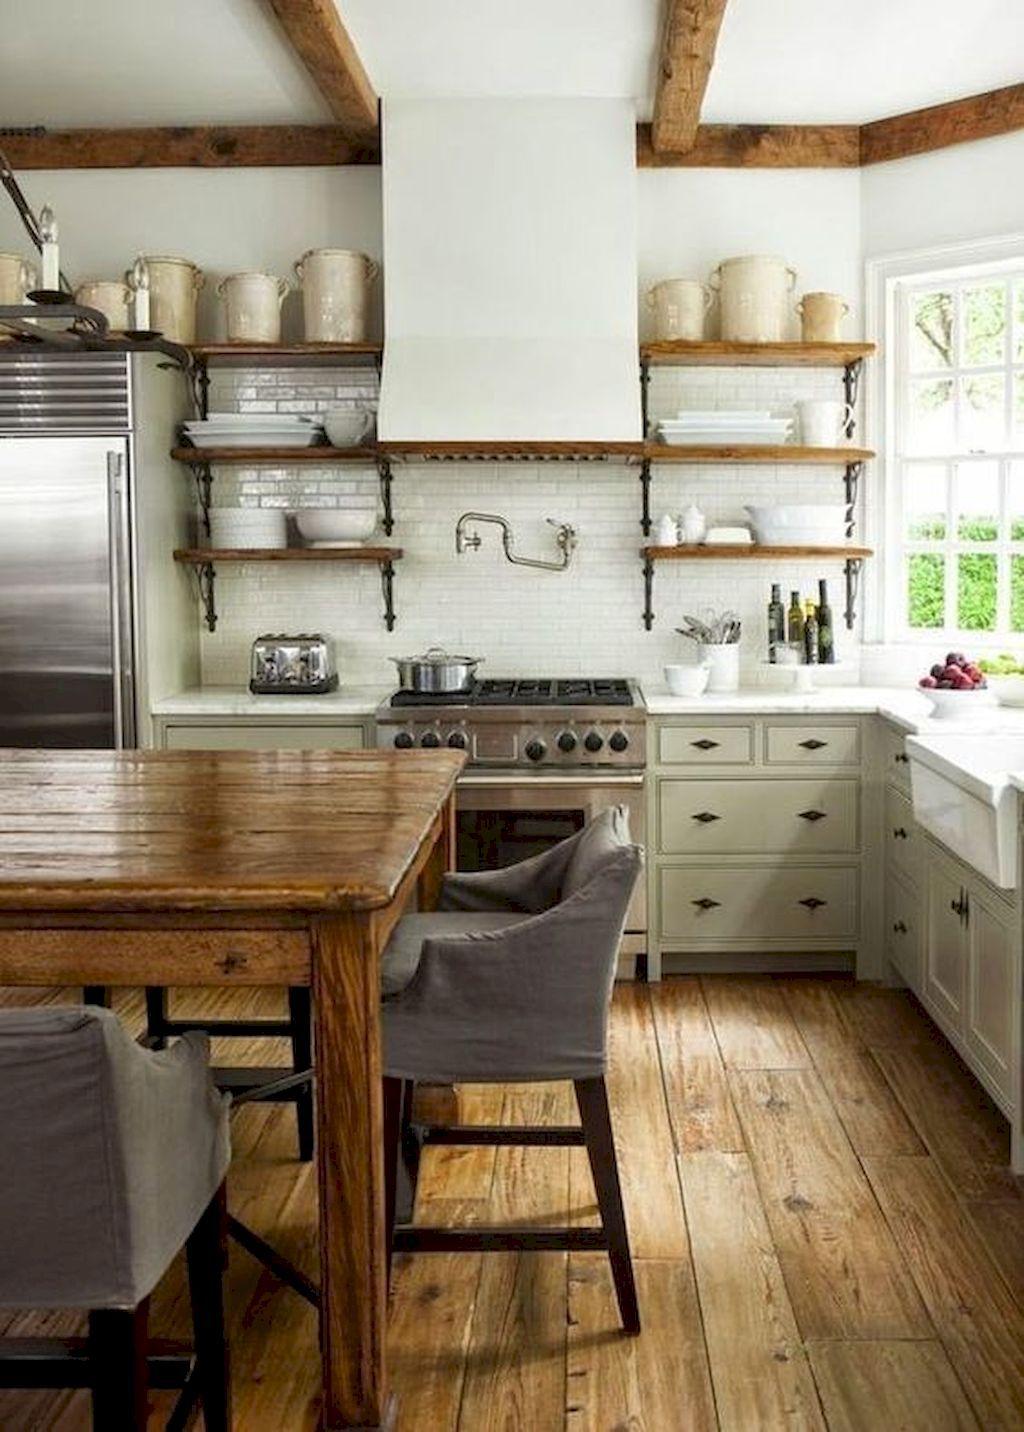 farm house kitchen floor.jpg